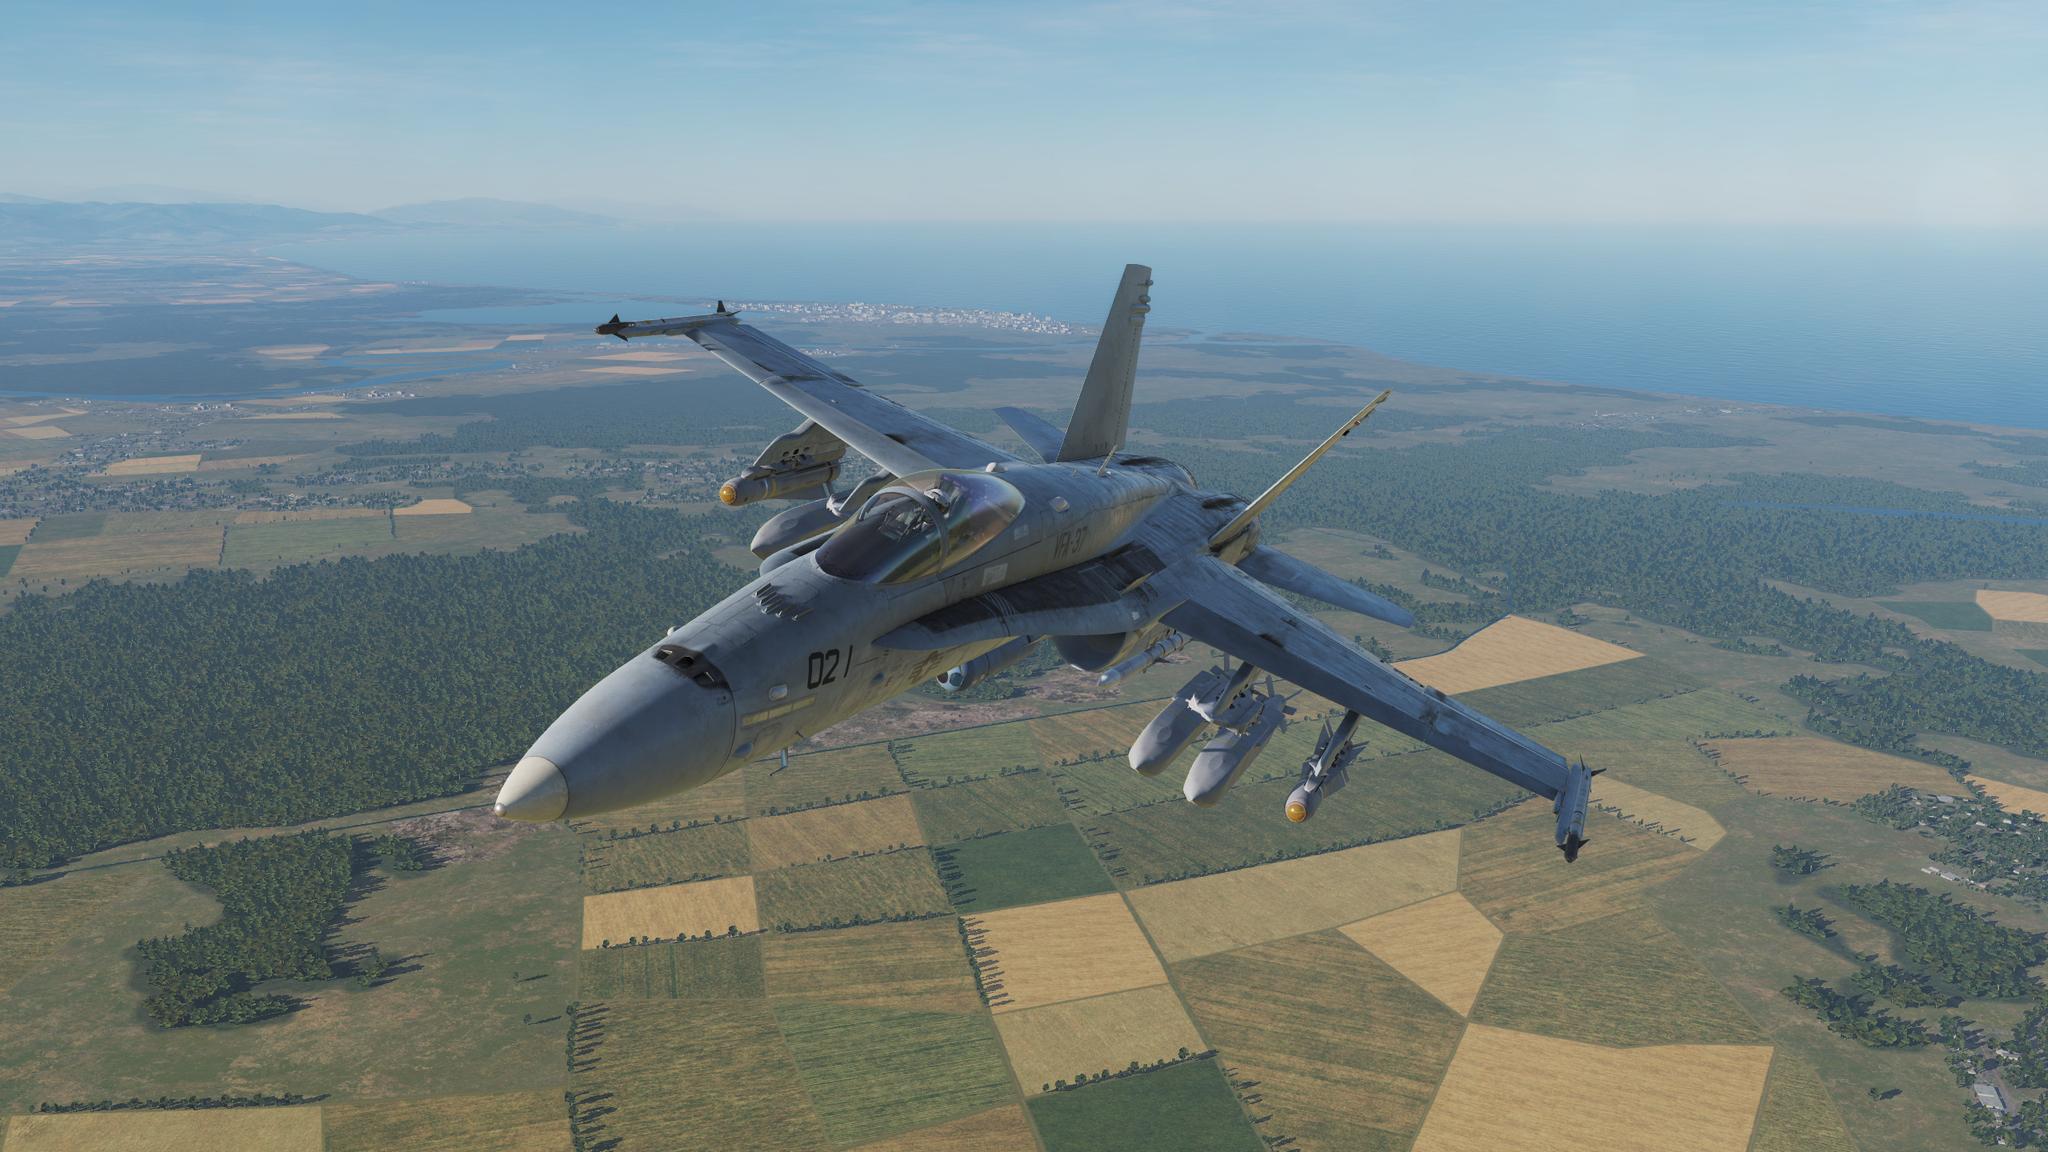 Обои Mcdonnell douglas, истребитель, Самолёт, eagle, Облака. Авиация foto 2